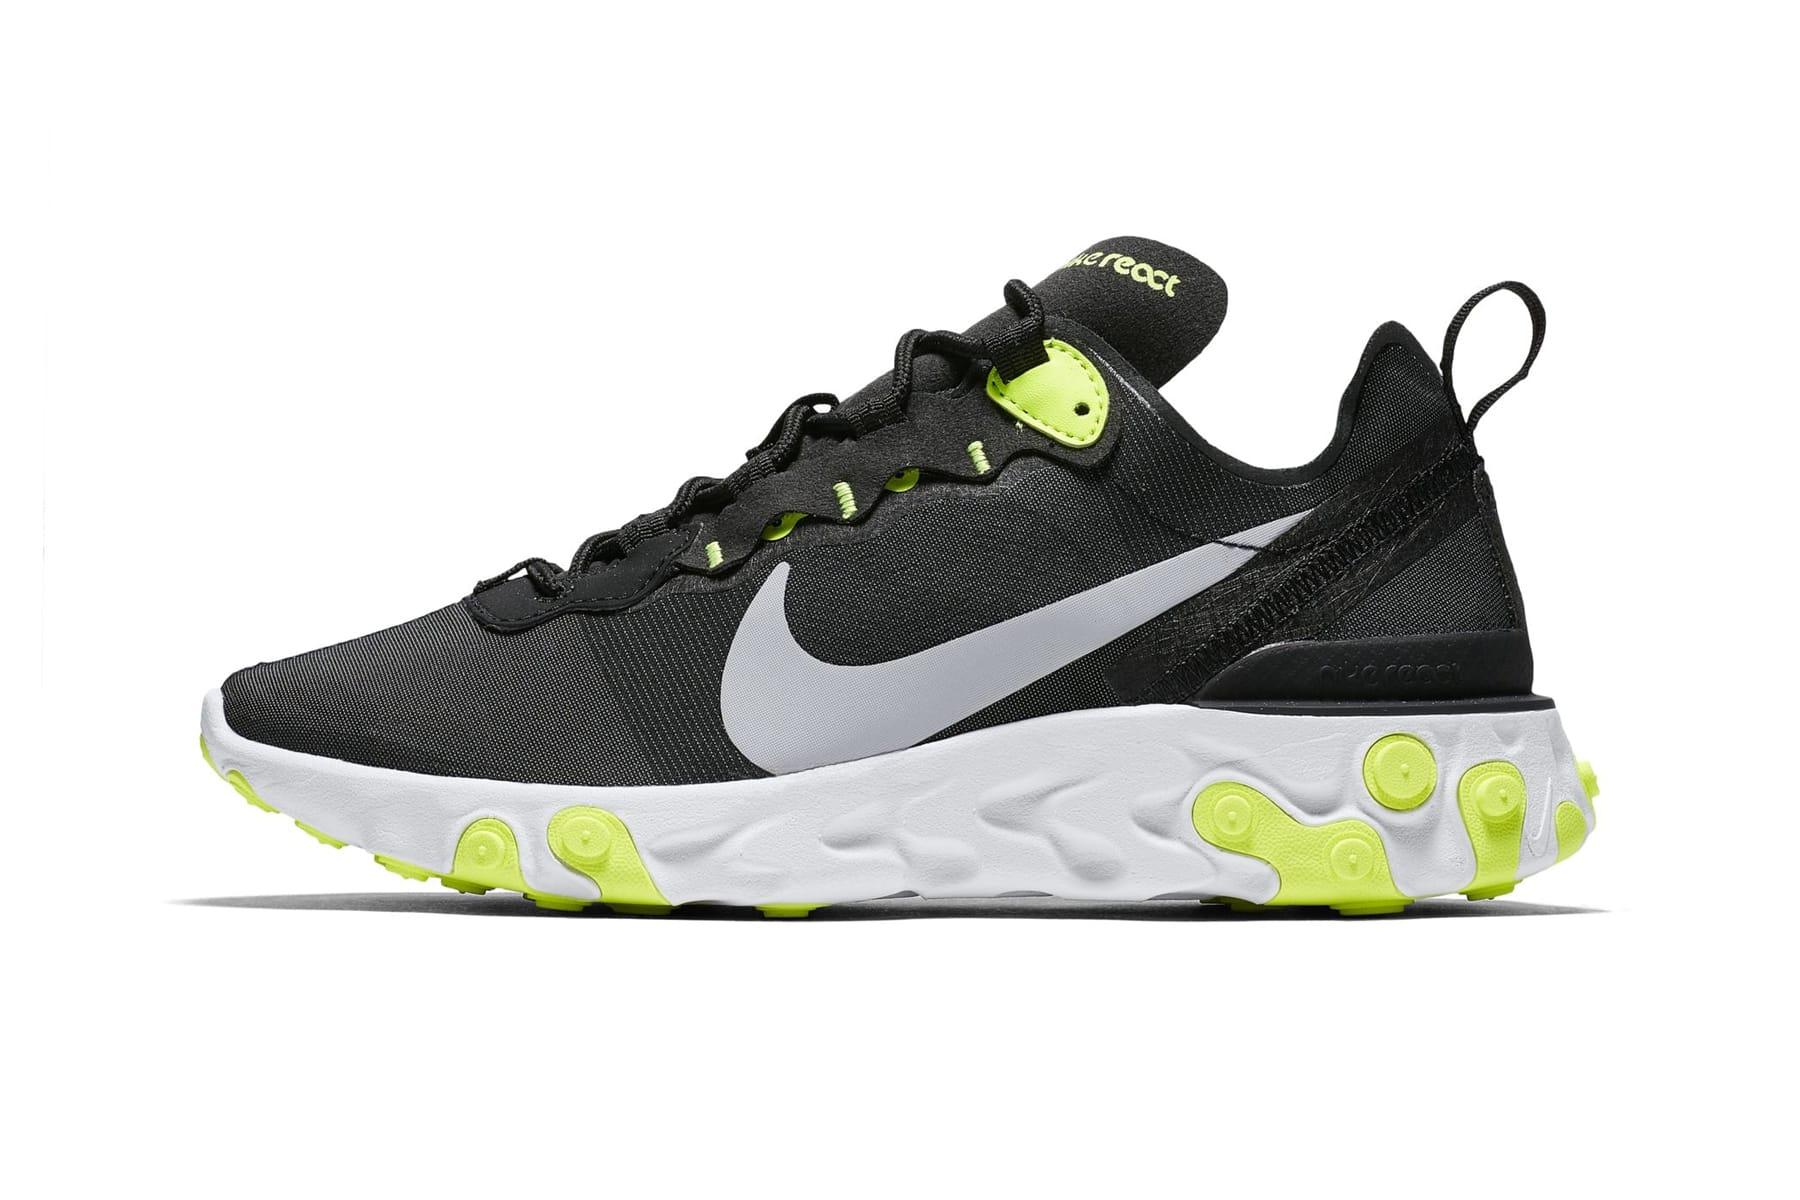 Nike React Element 55 Sneaker Colors